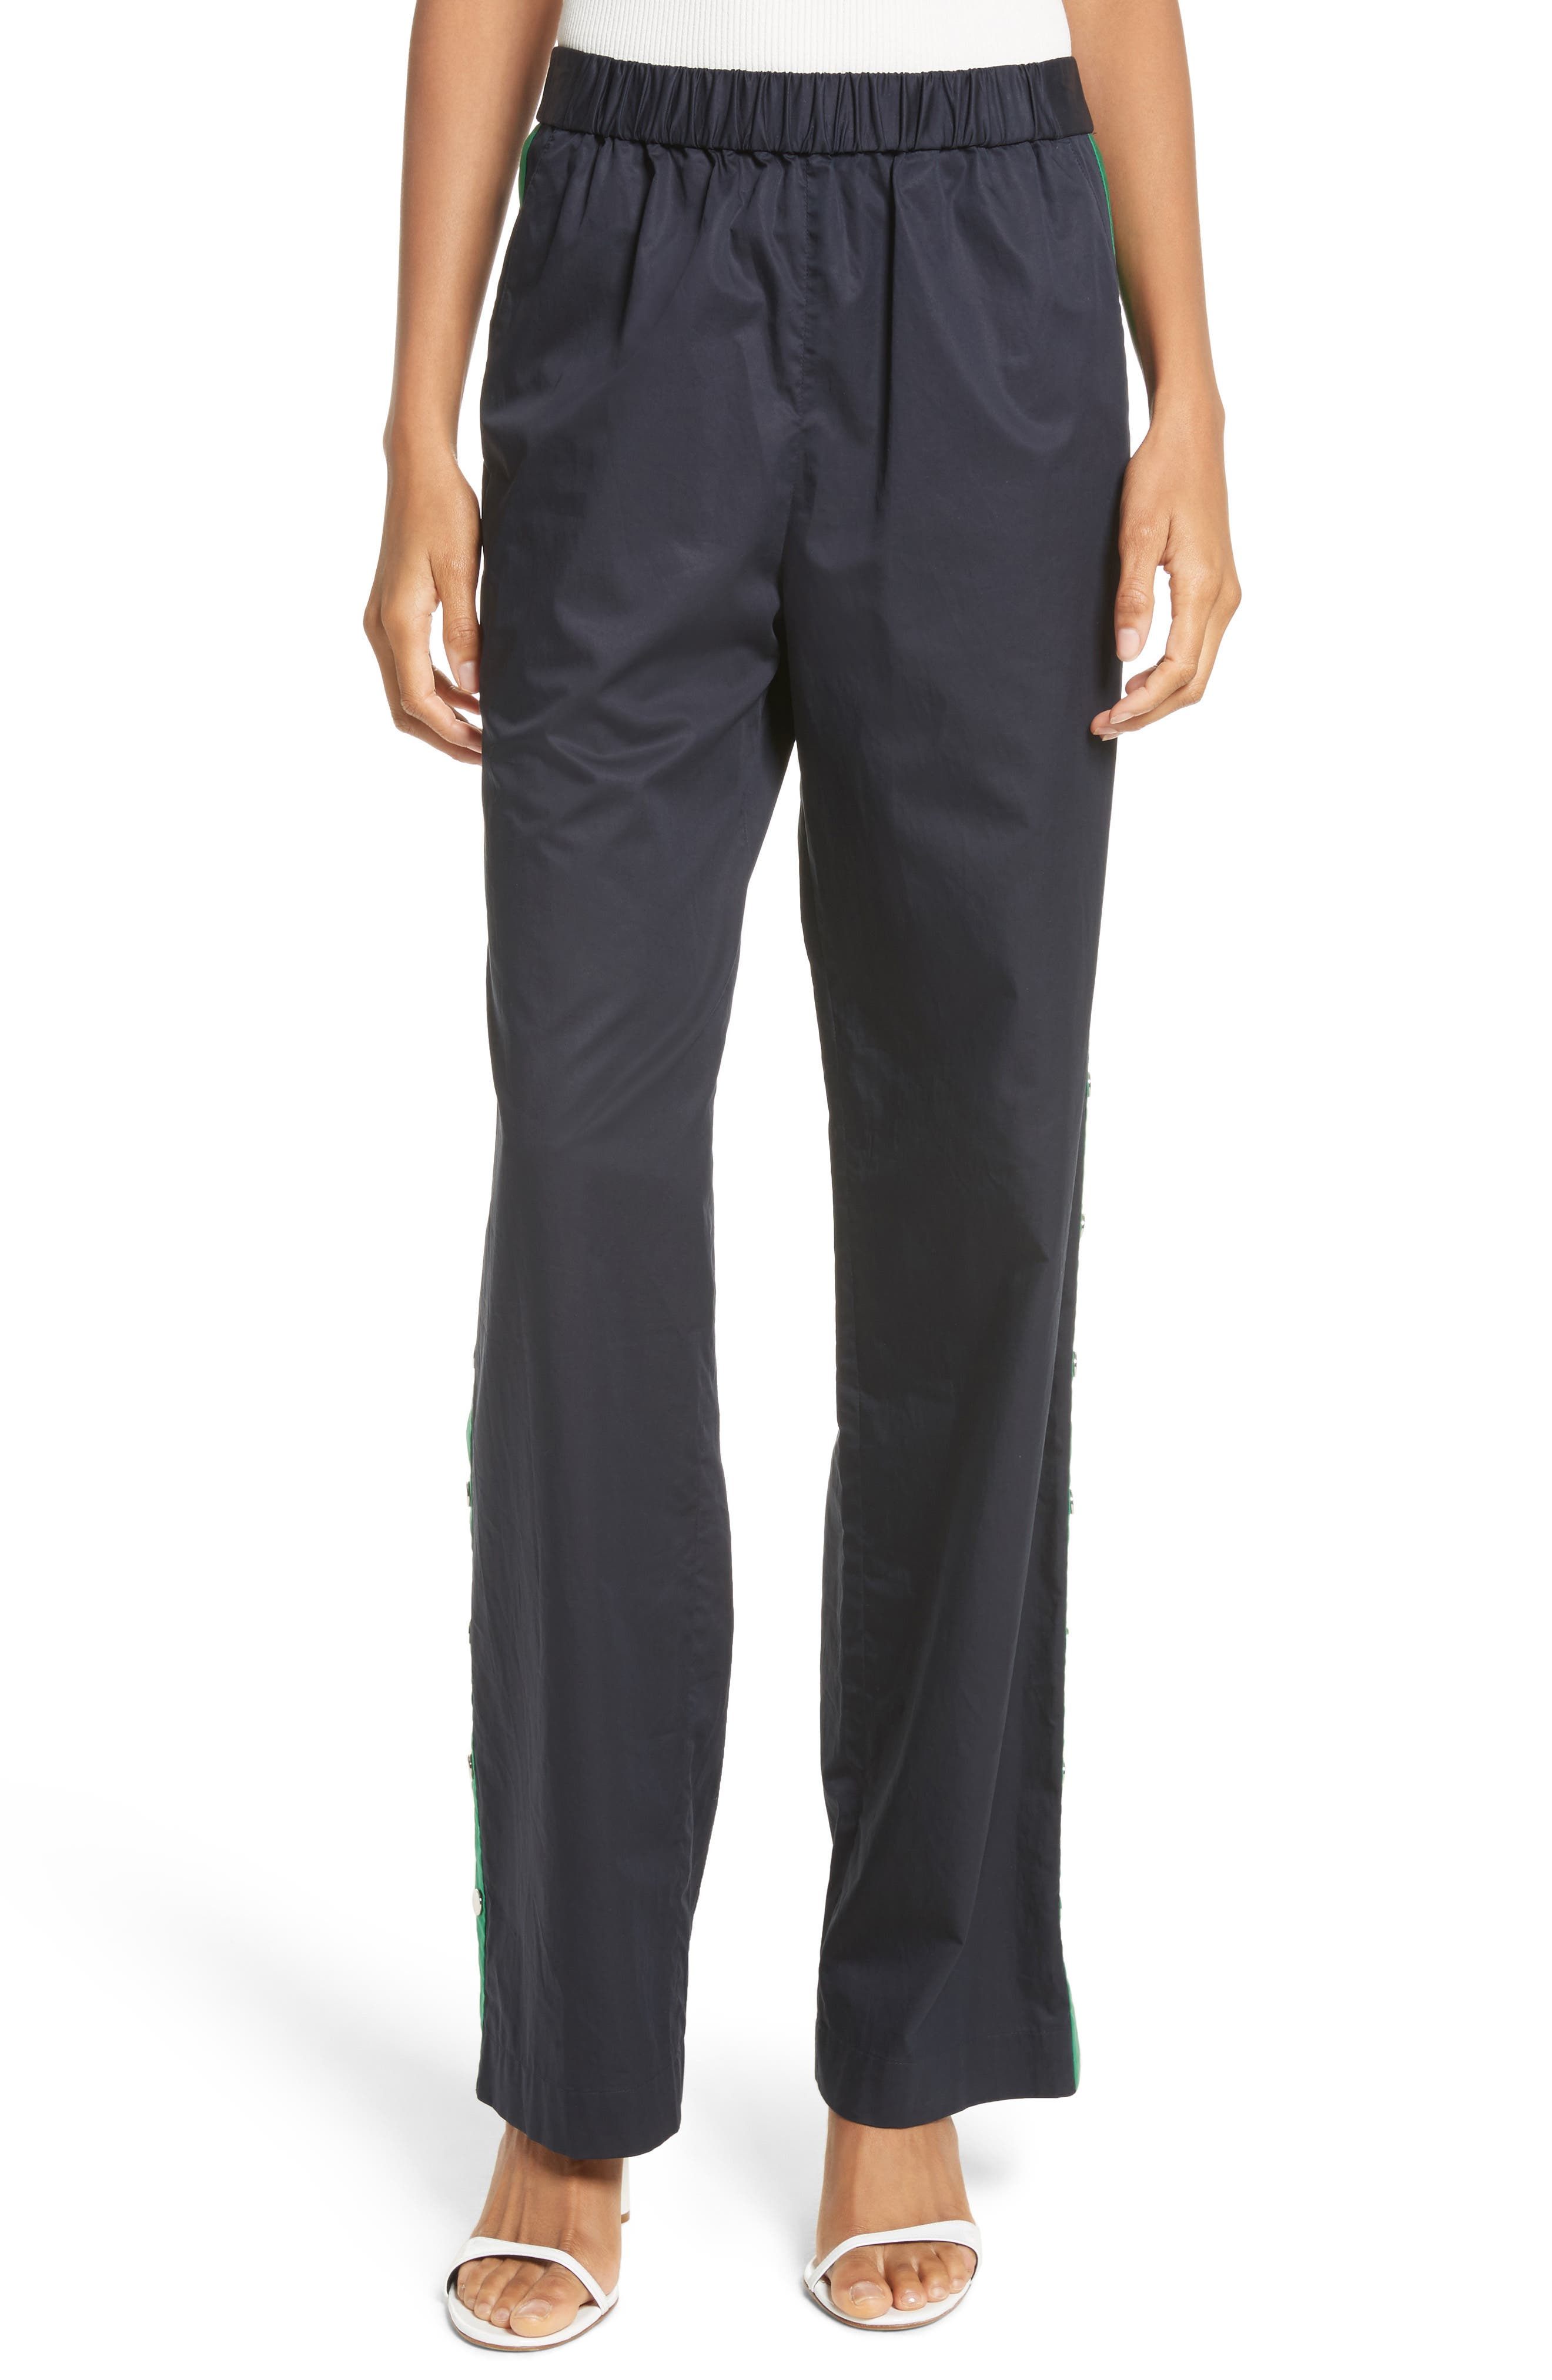 Snap Side Track Pants,                             Main thumbnail 1, color,                             Navy/ Green Multi